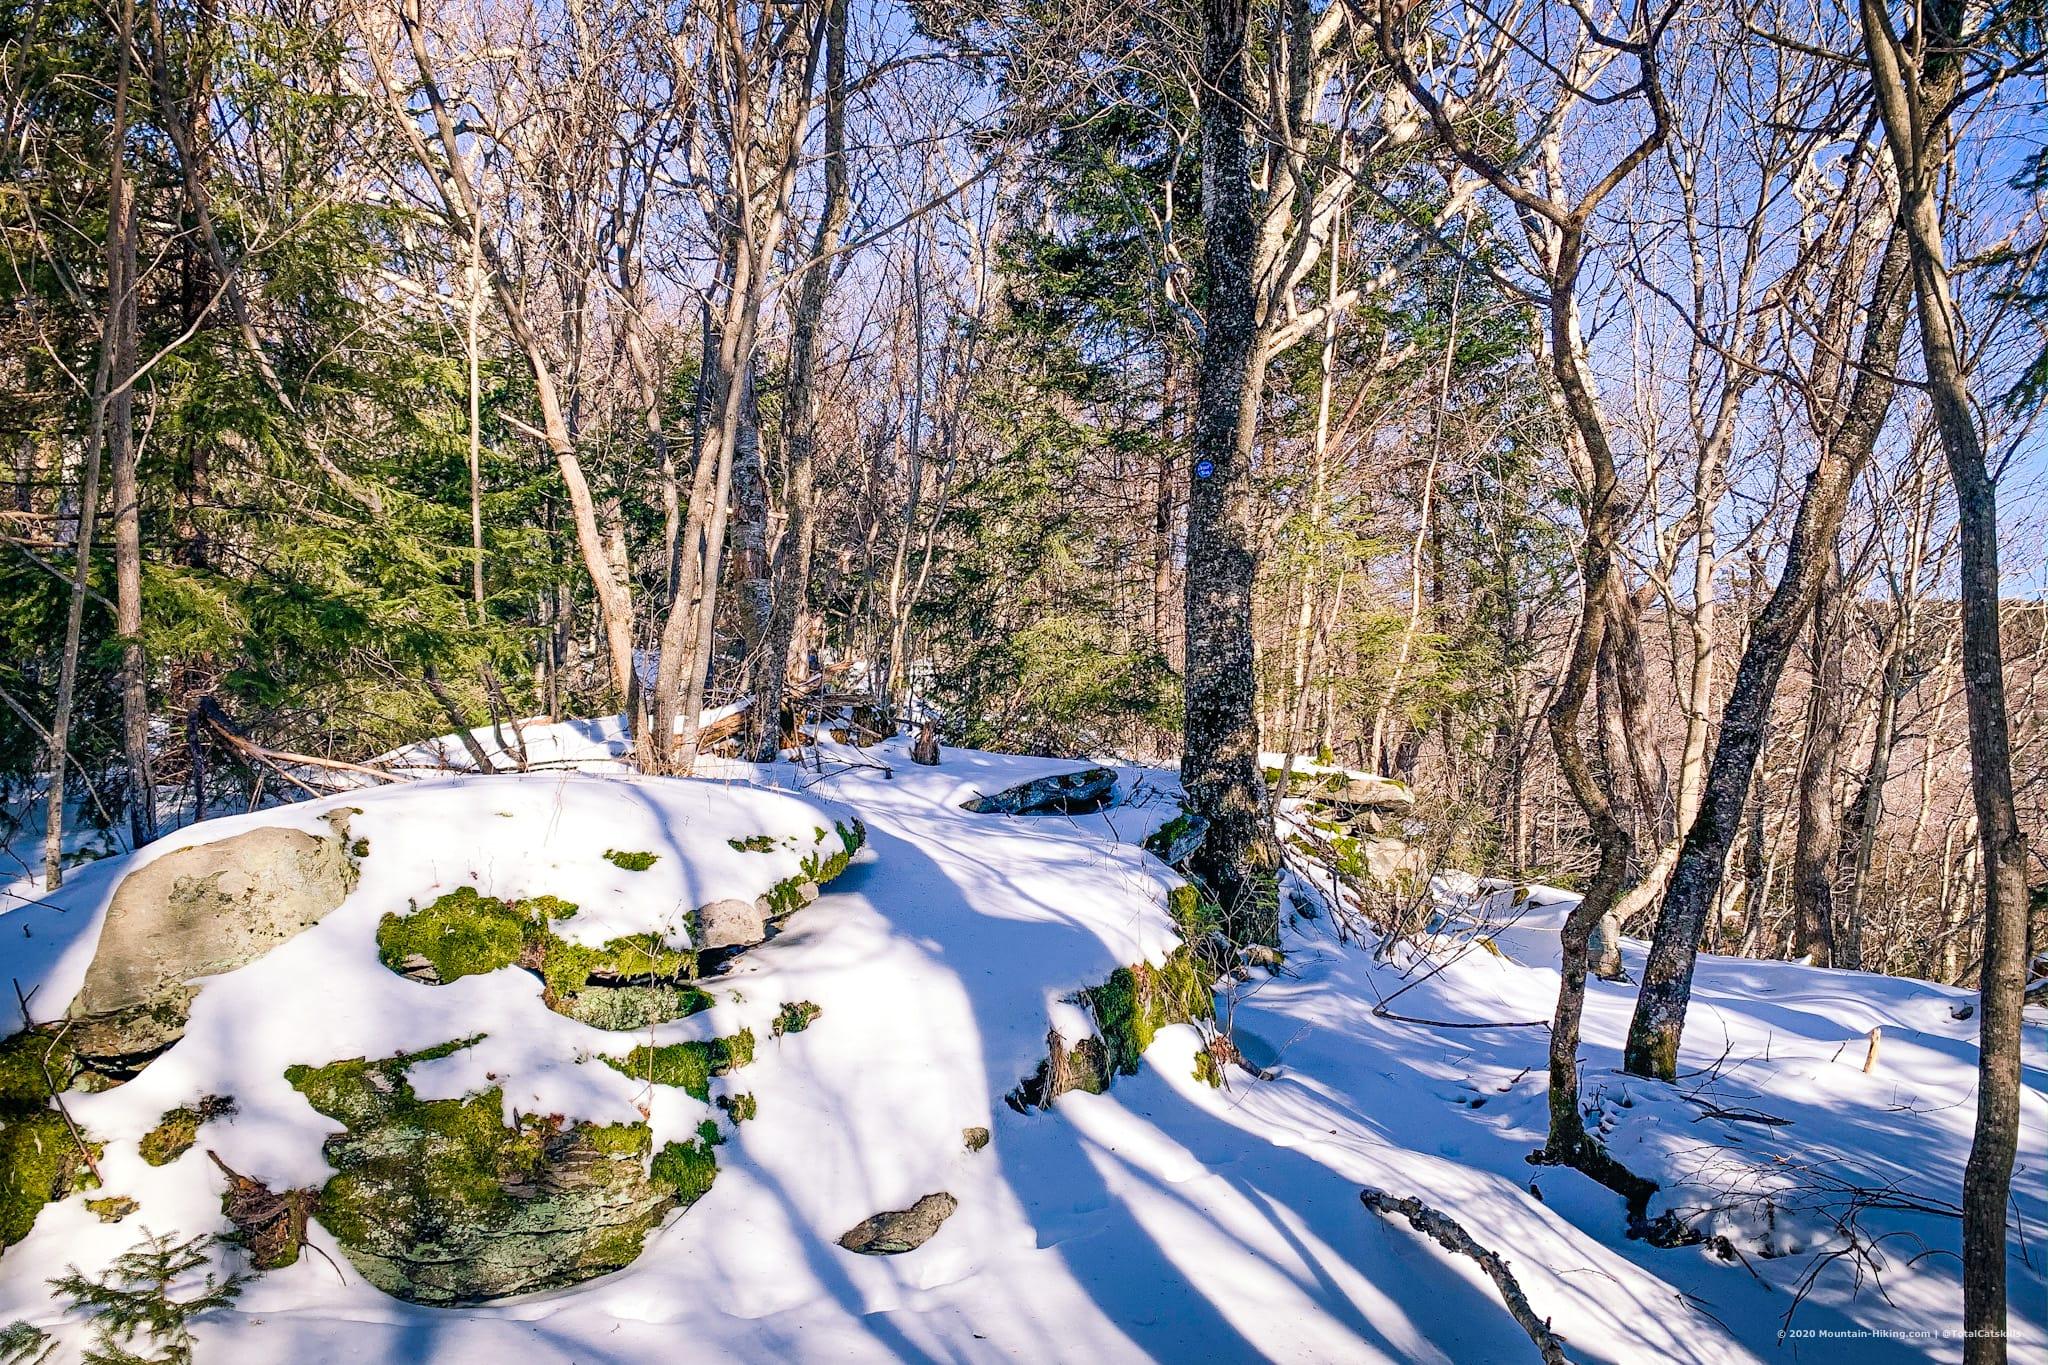 trail, rocks, trees, snow